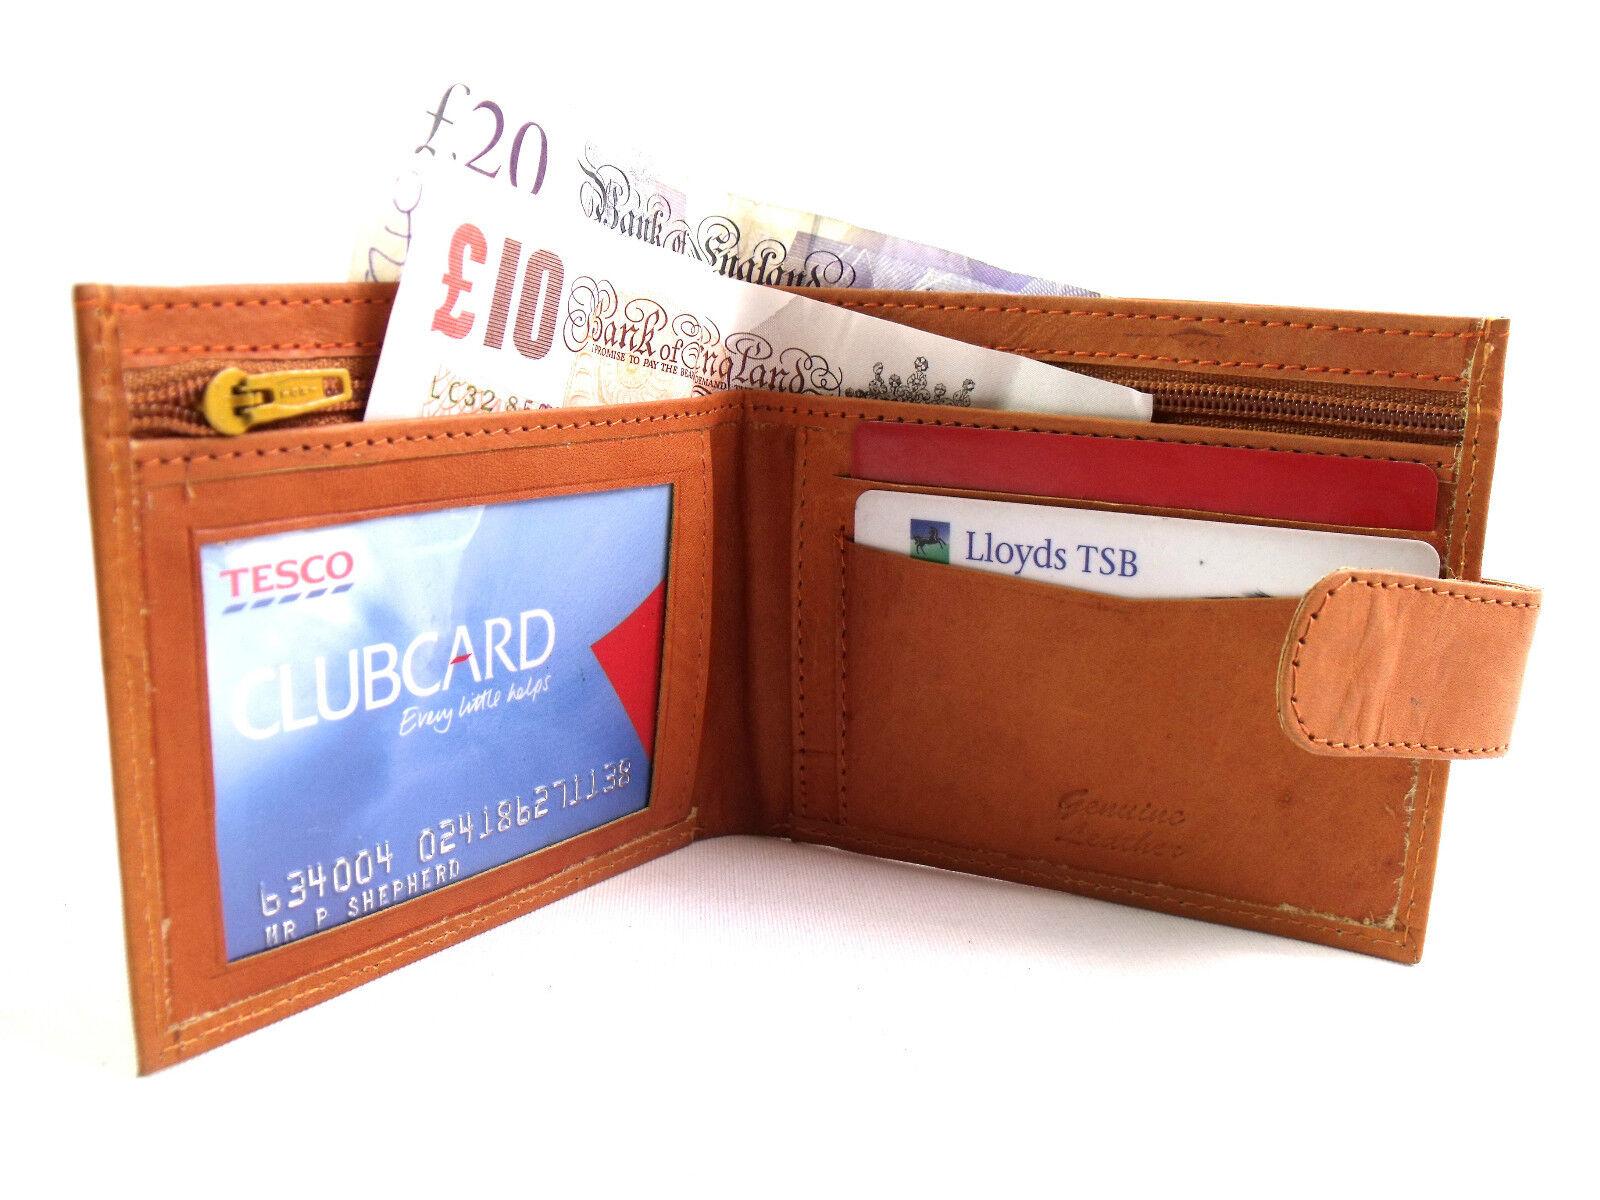 Herren Damen Hochwertig Slim Echtleder Etui Kreditkartenhalter Geldbörse